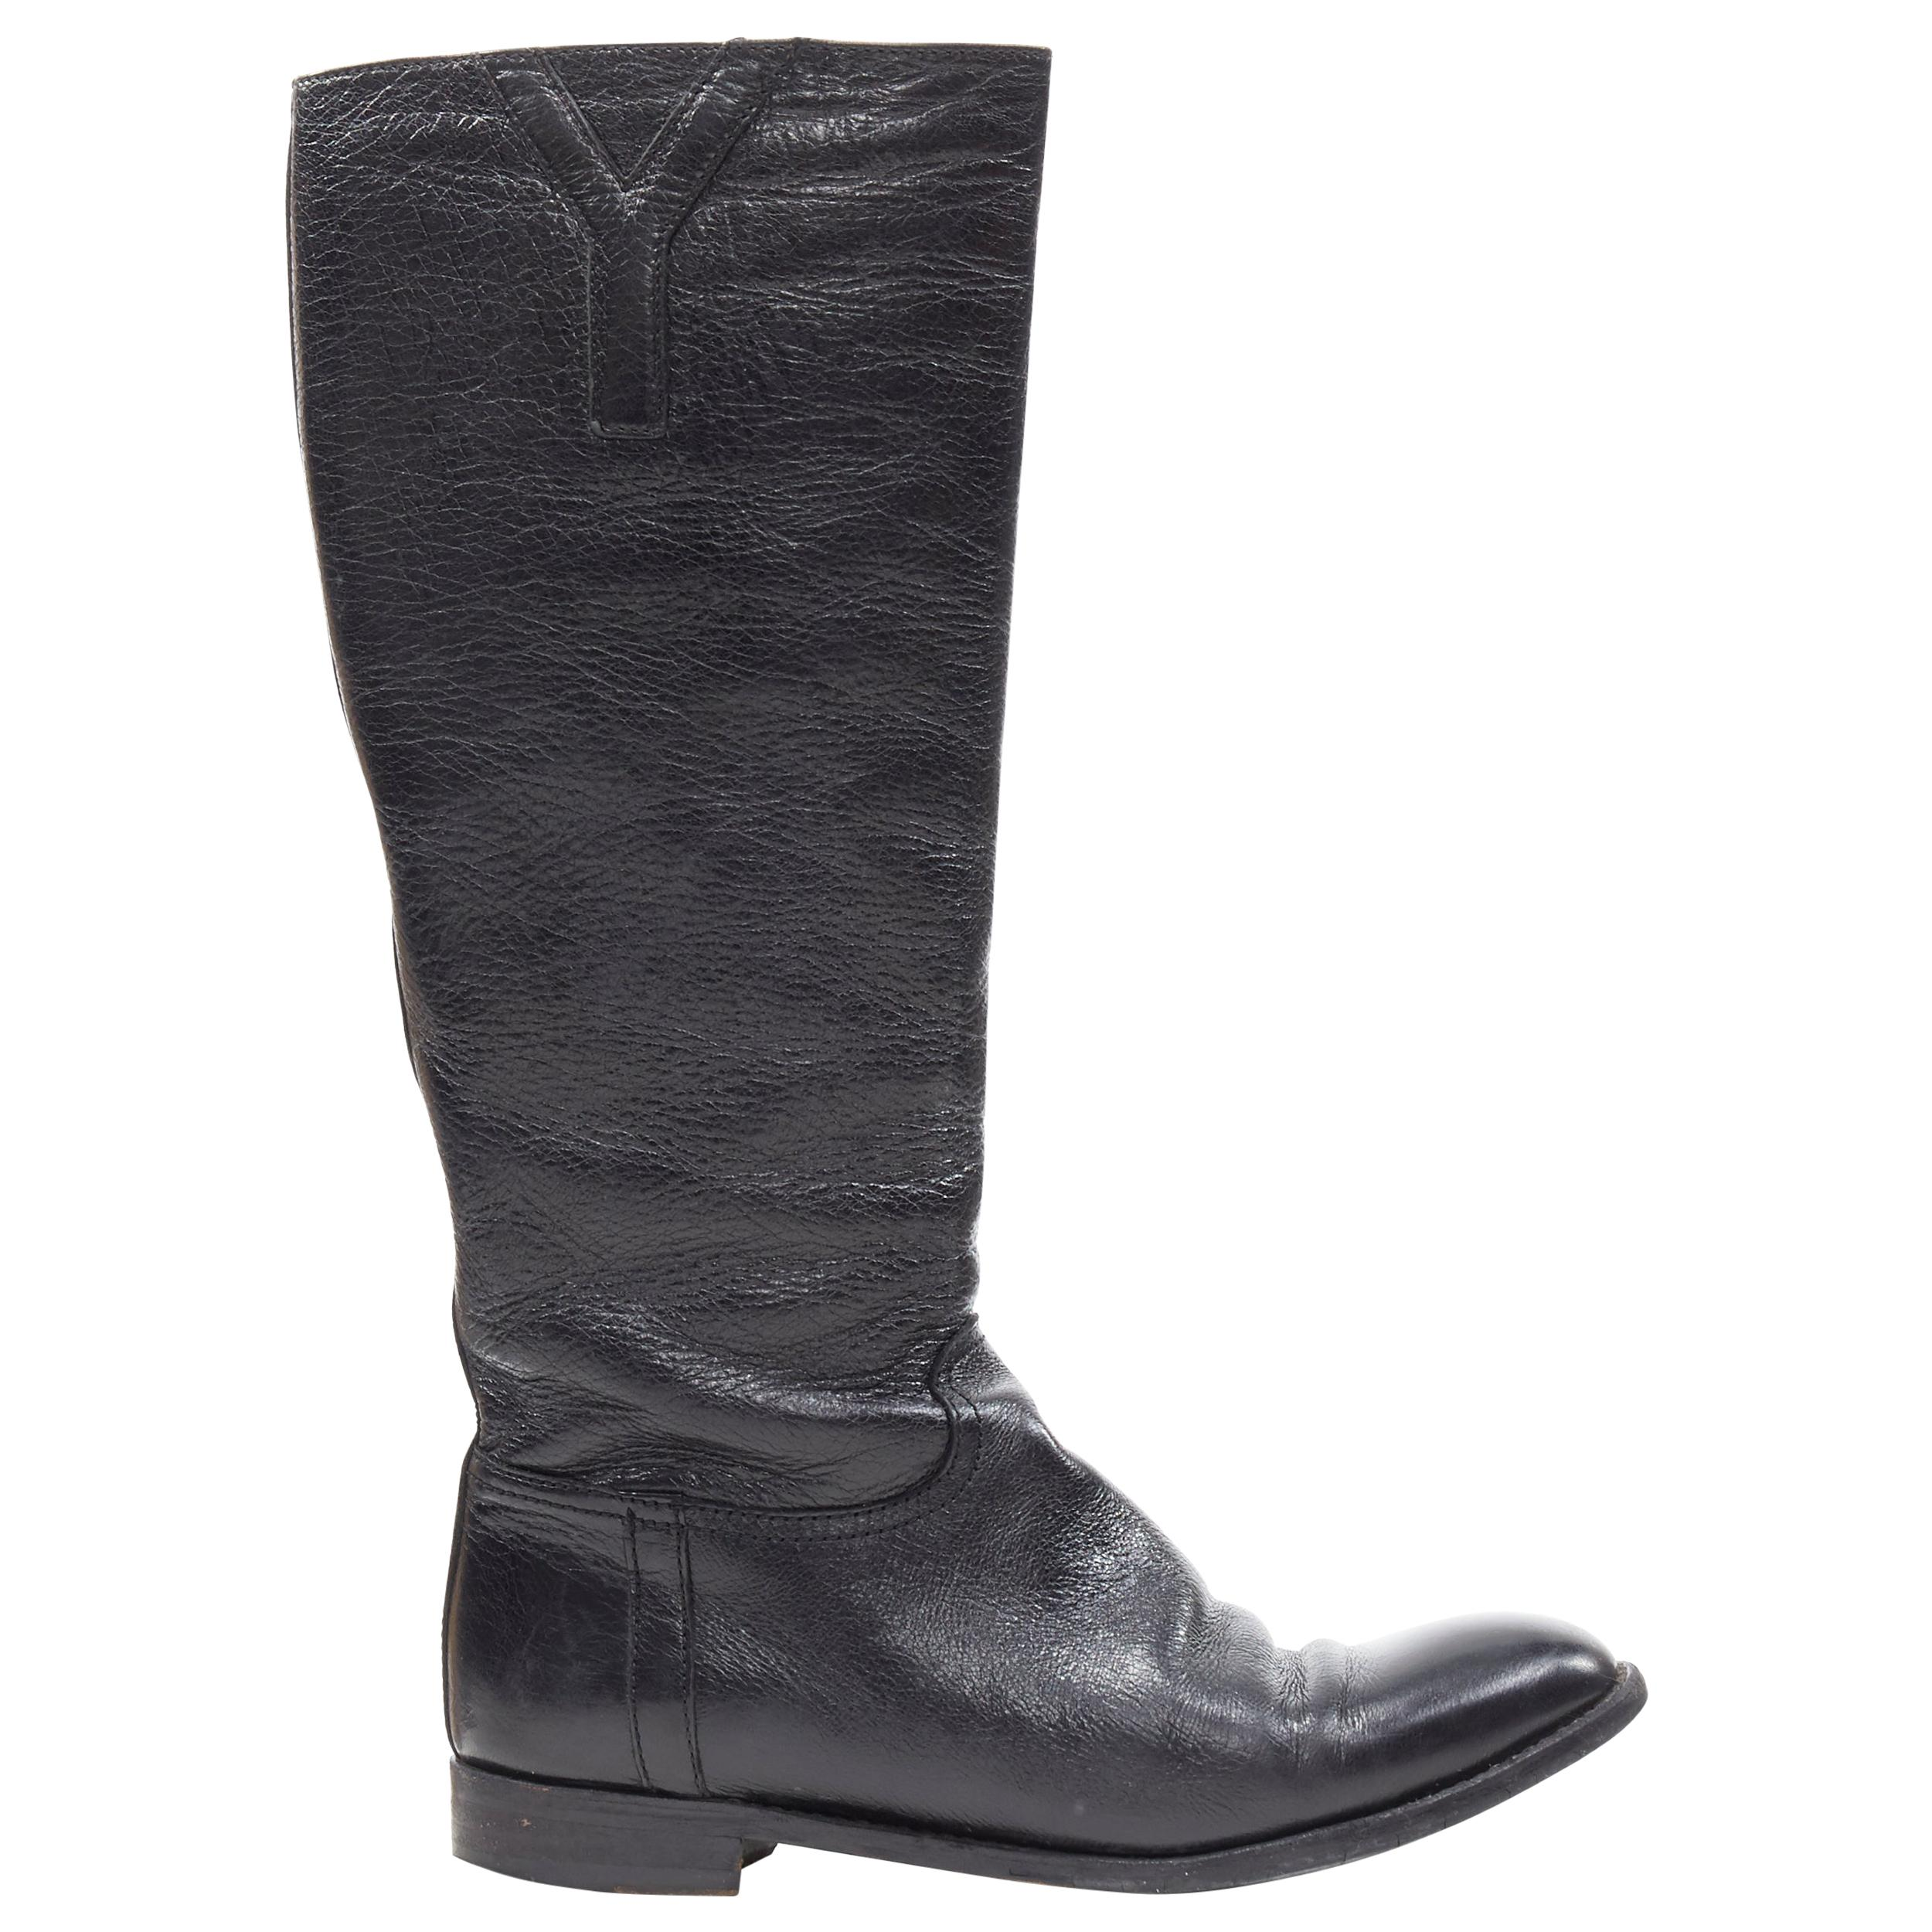 YVES SAINT LAURENT Y logo almond toe black pebble leather flat tall boots EU38.5